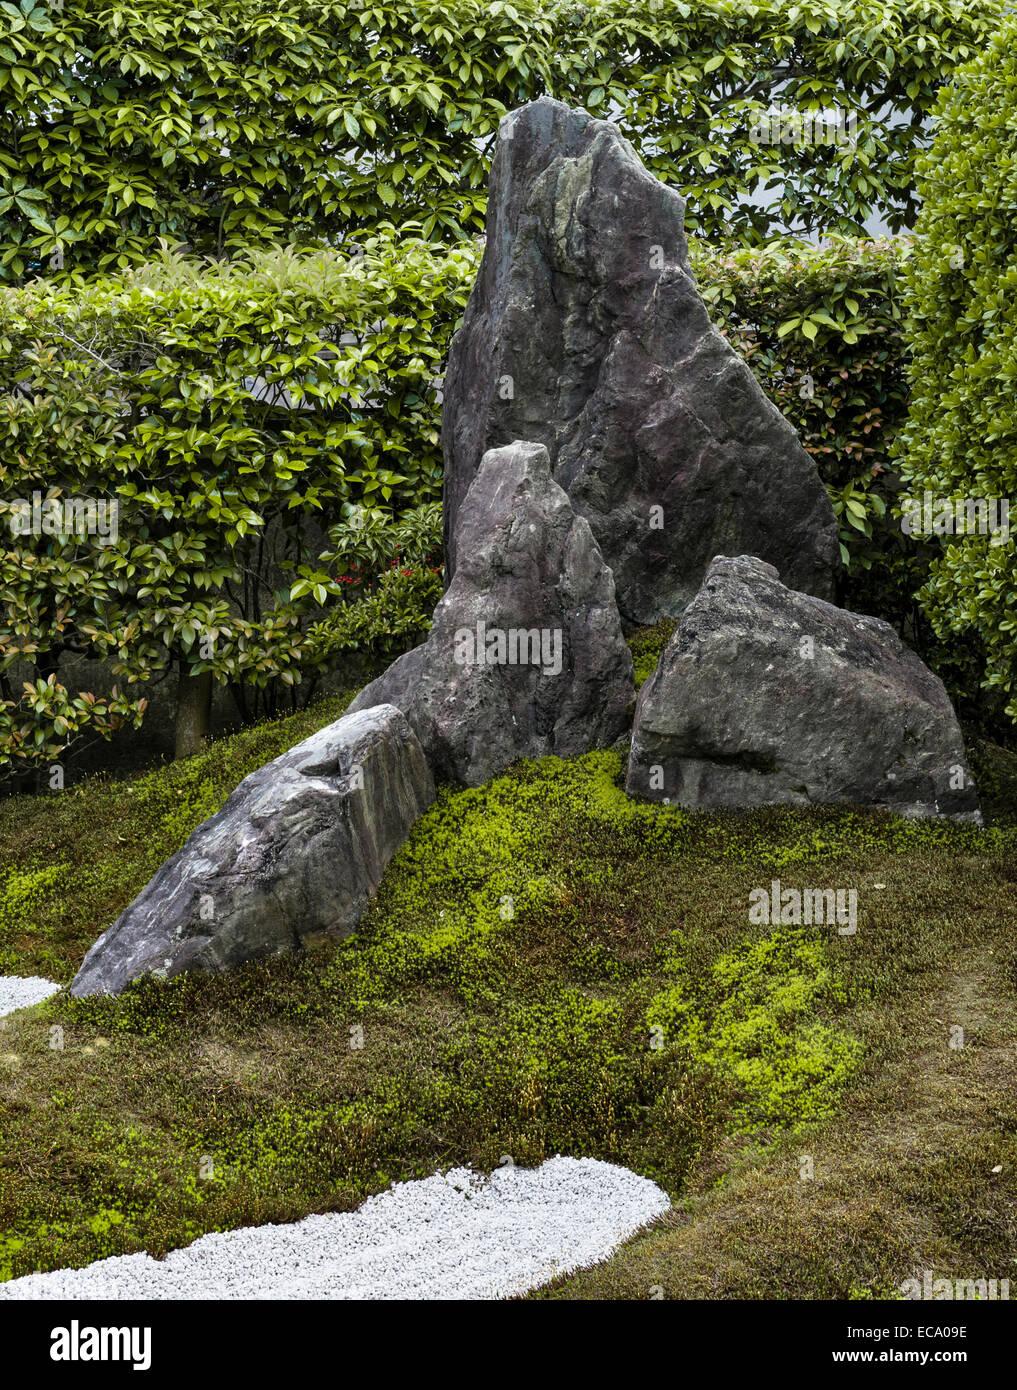 Zuiho-in zen temple, Daitoku-ji, Kyoto, Japan. This rock in the South Garden symbolises Mt Horai - Stock Image